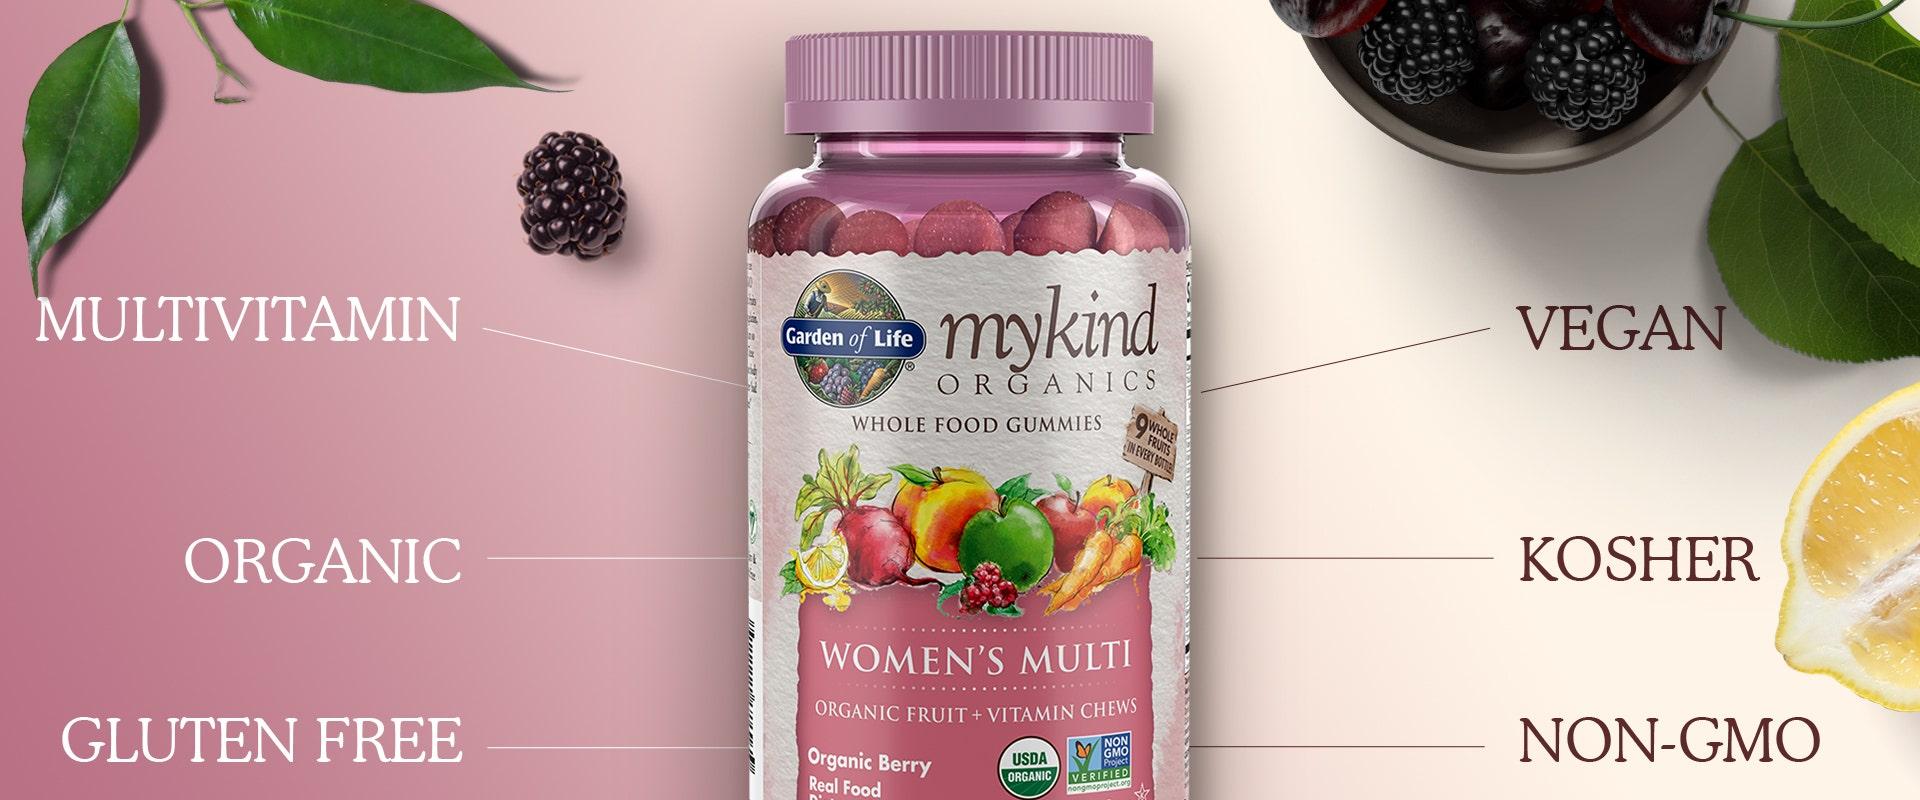 Garden of Life mykind Multi Vitamin Womens Gummies